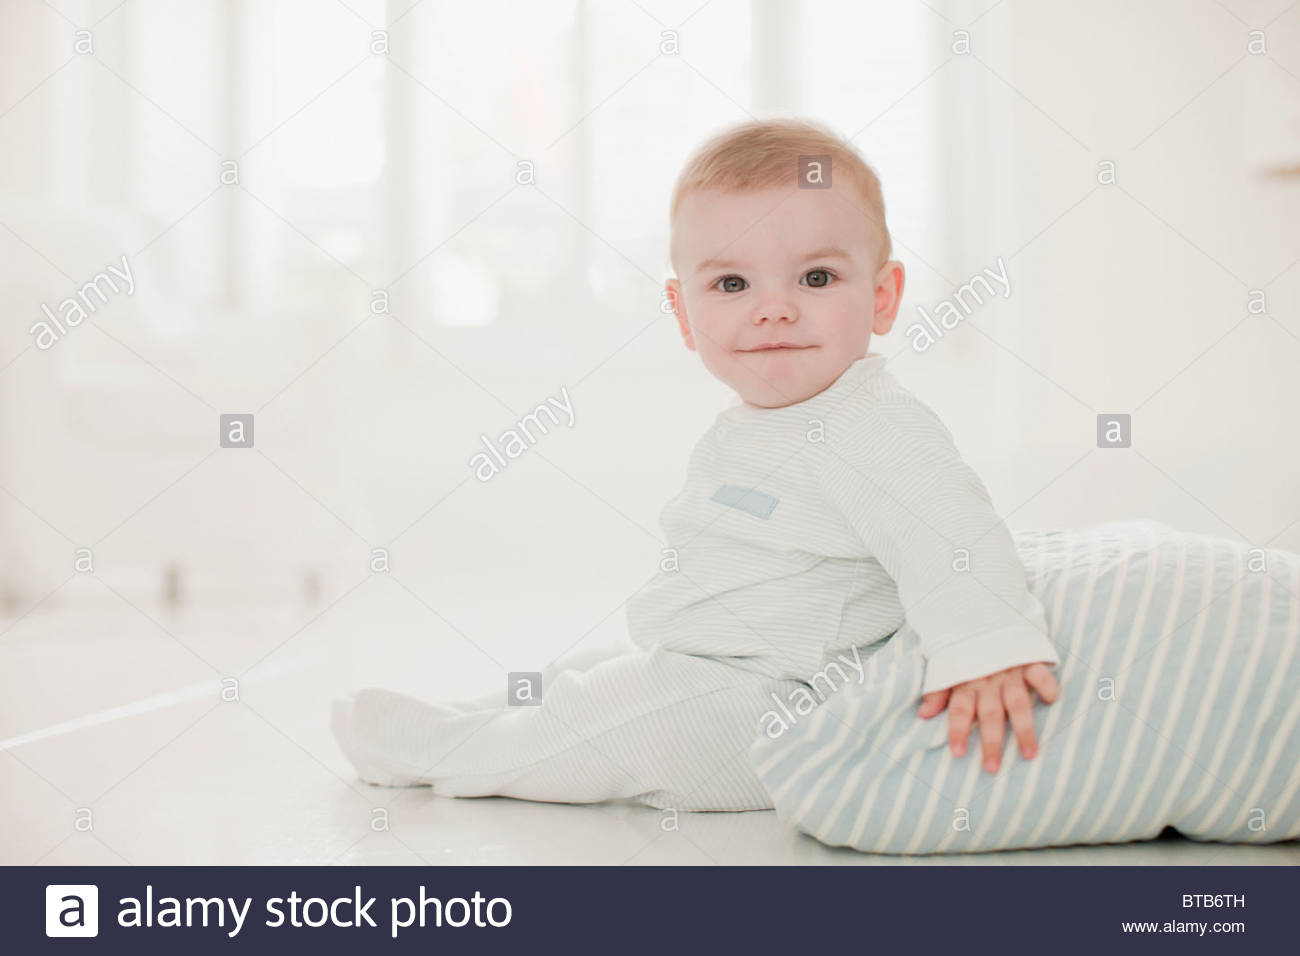 Lächelnden Baby Erdgeschoss mit Kissen Stockbild